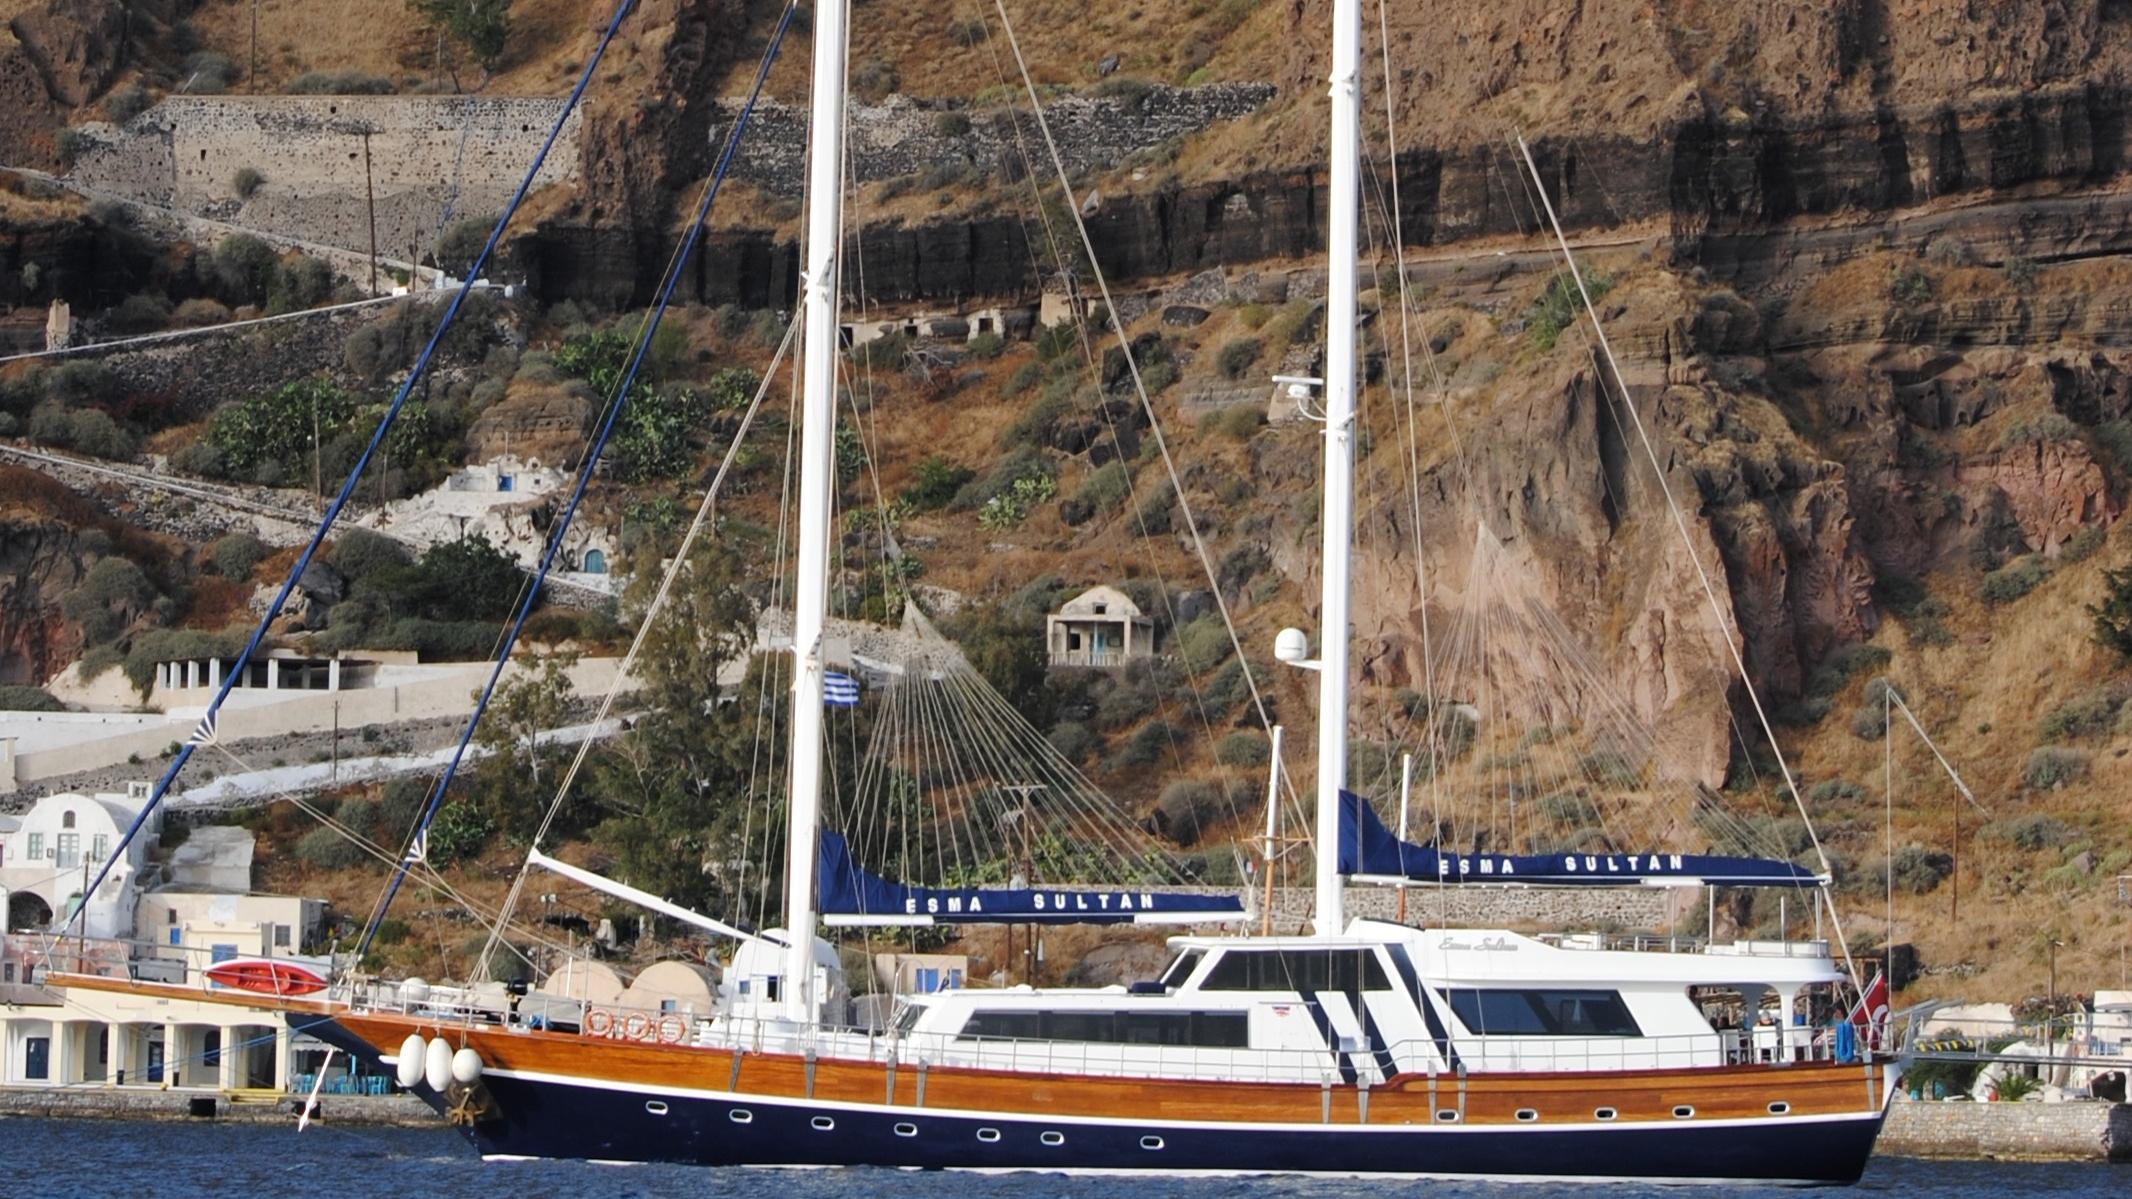 esma-sultan-yacht-at-anchor